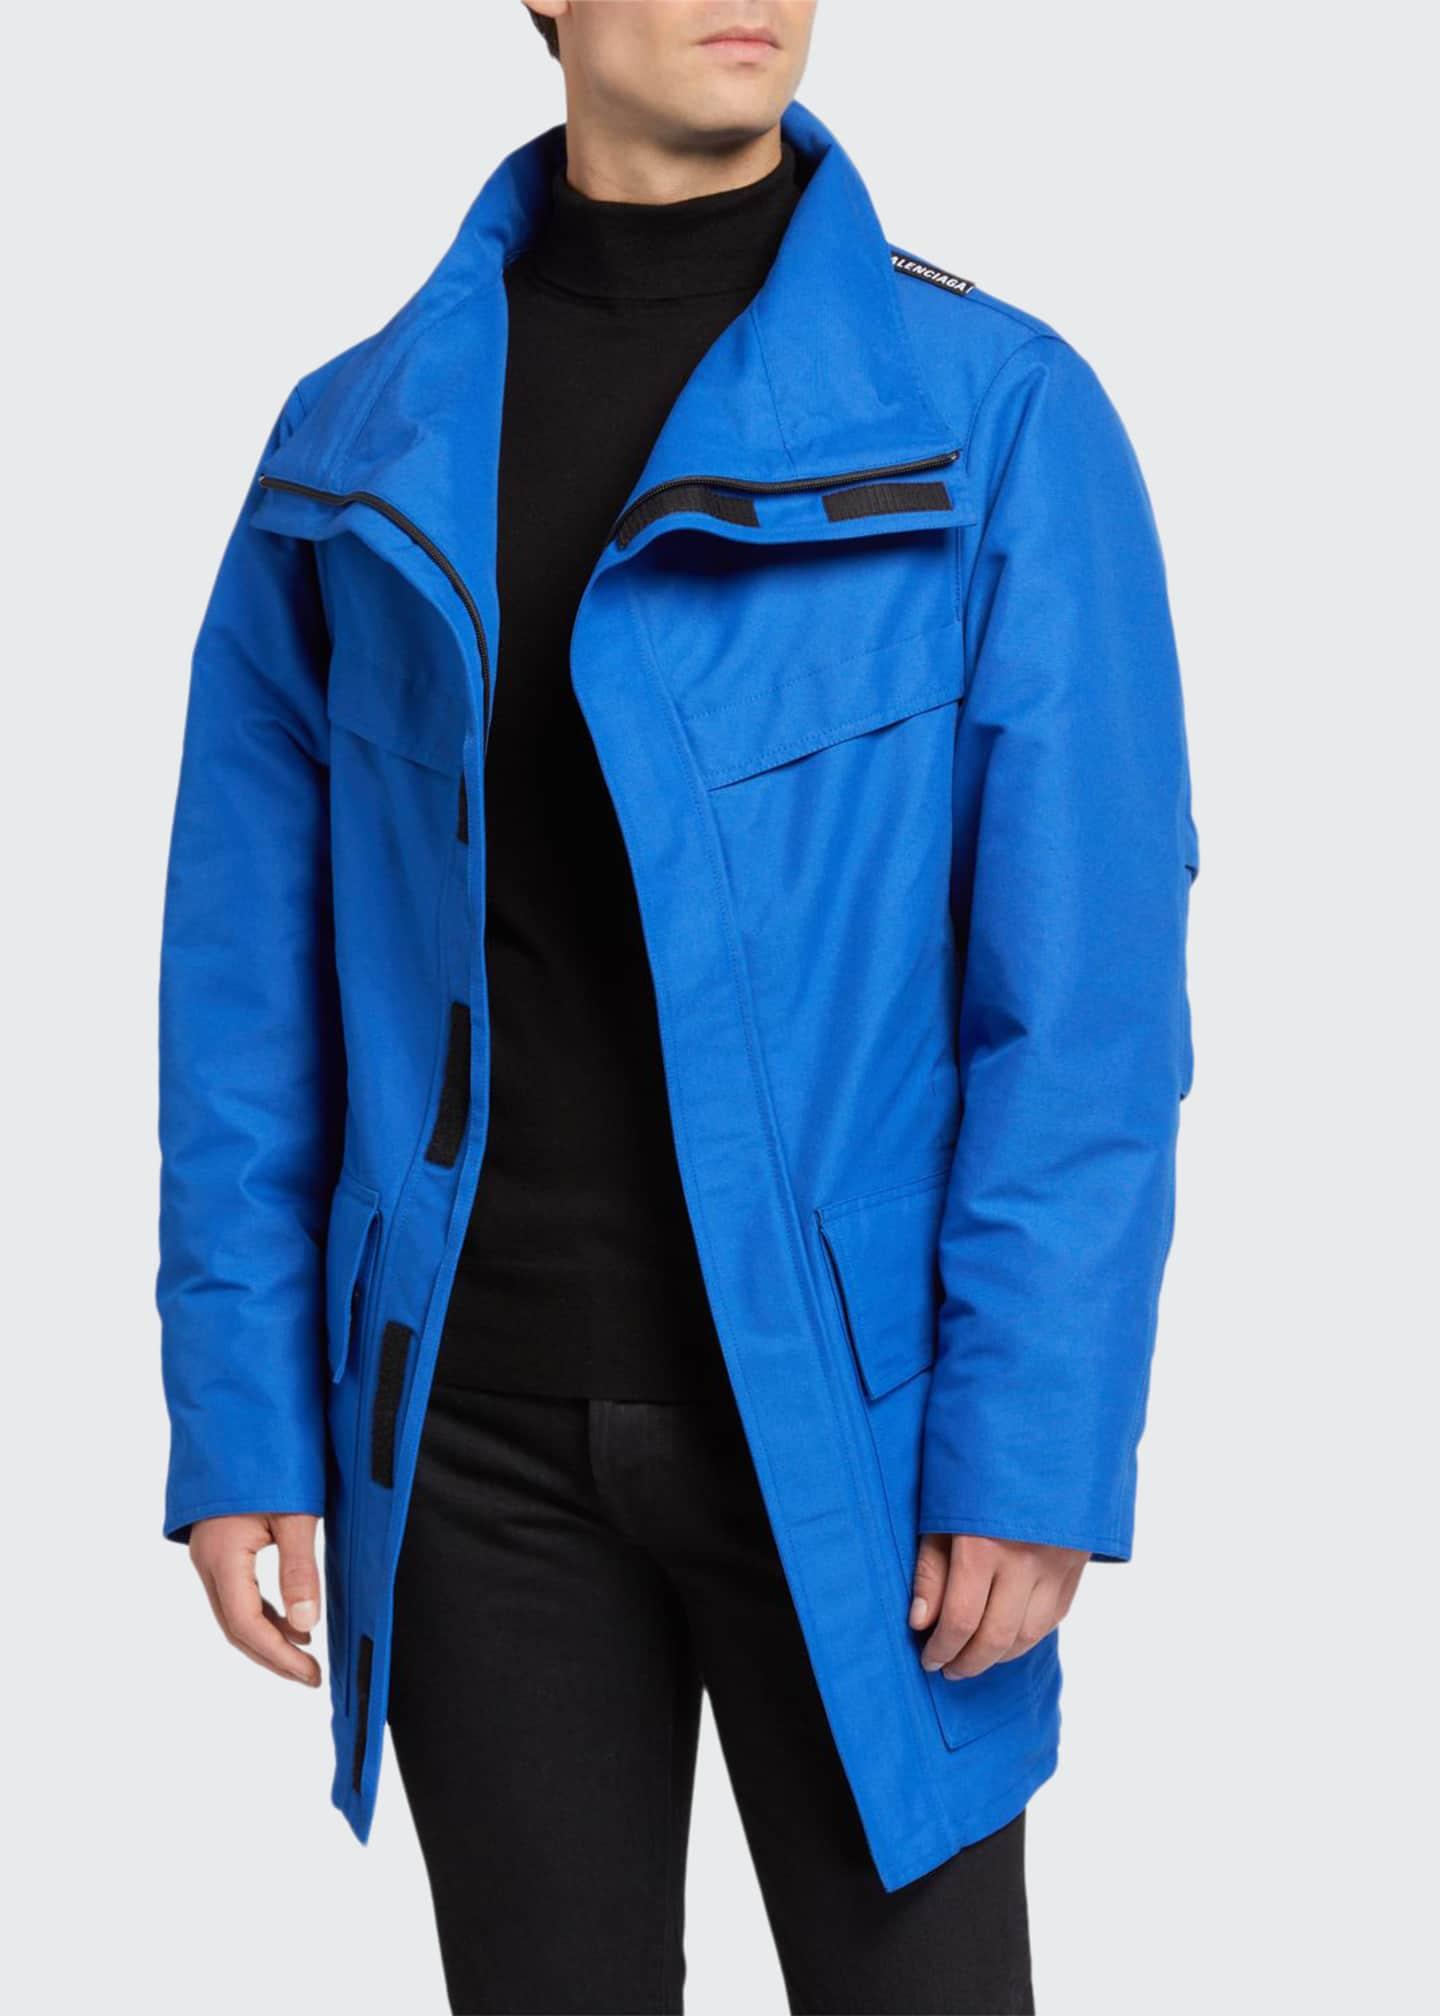 Balenciaga Men's High-Neck Zip-Front Puffer Coat